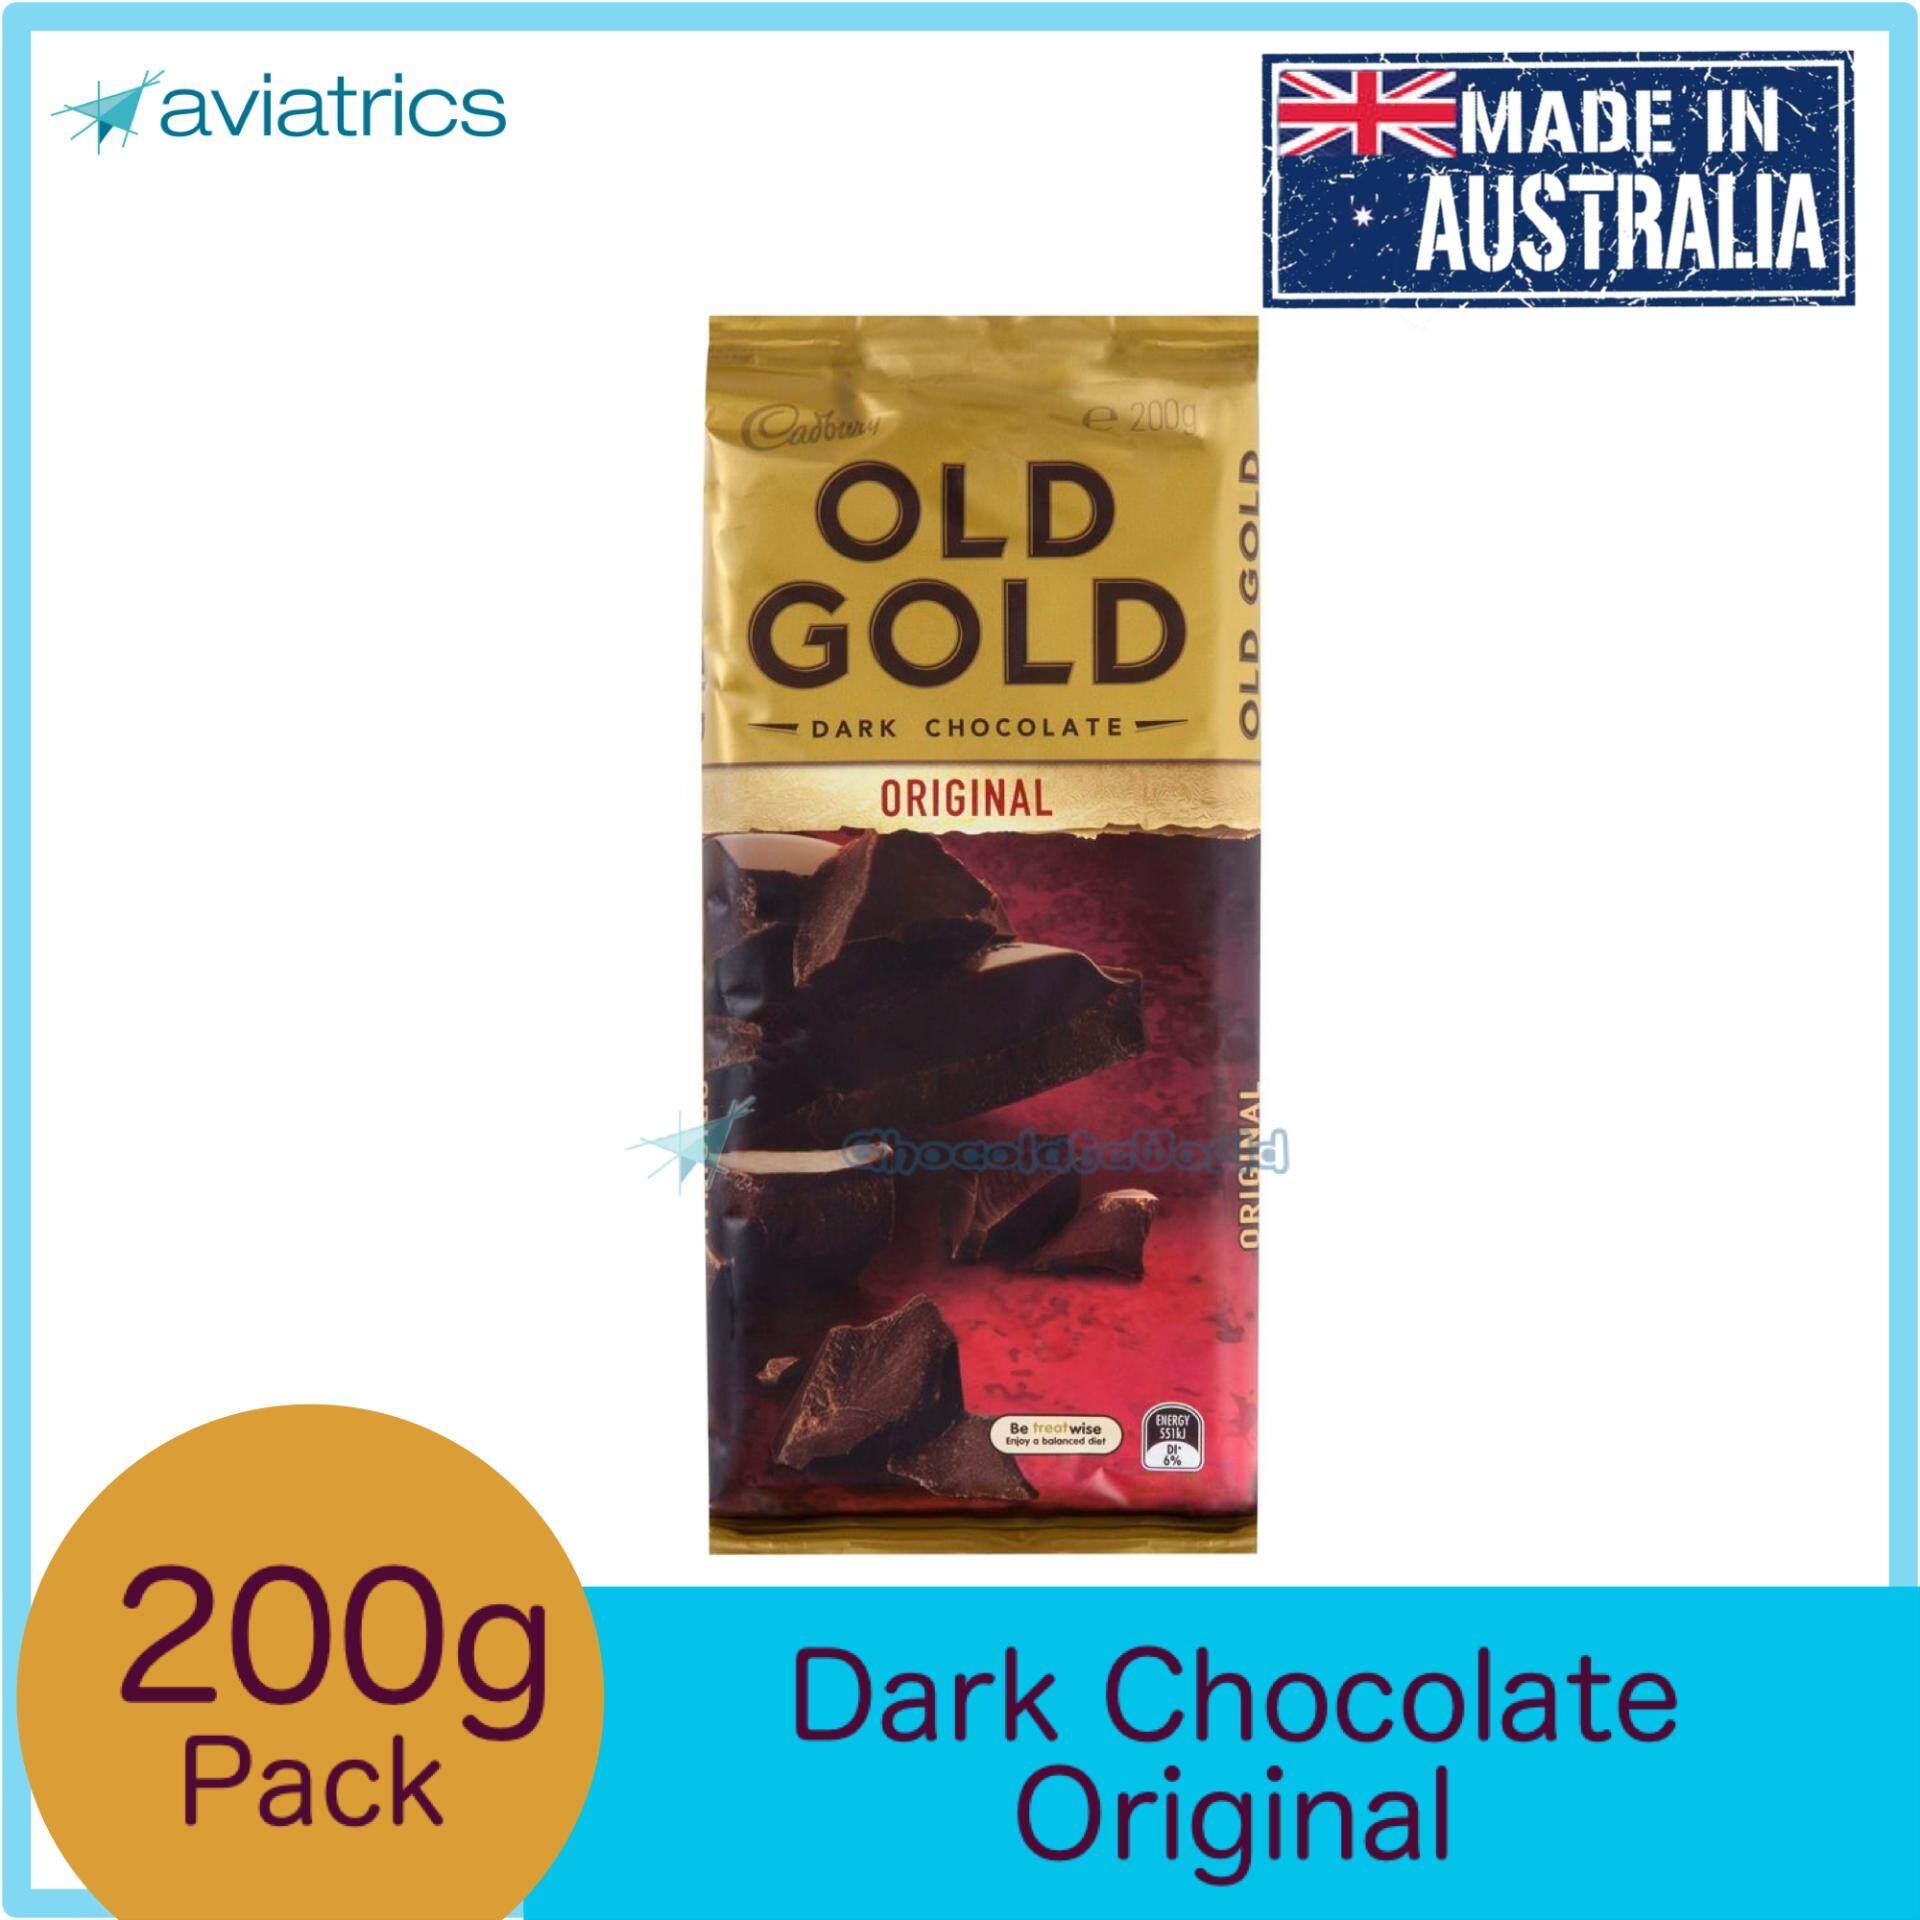 Cadbury Old Gold Dark Chocolate Original 180g (Made in Australia)